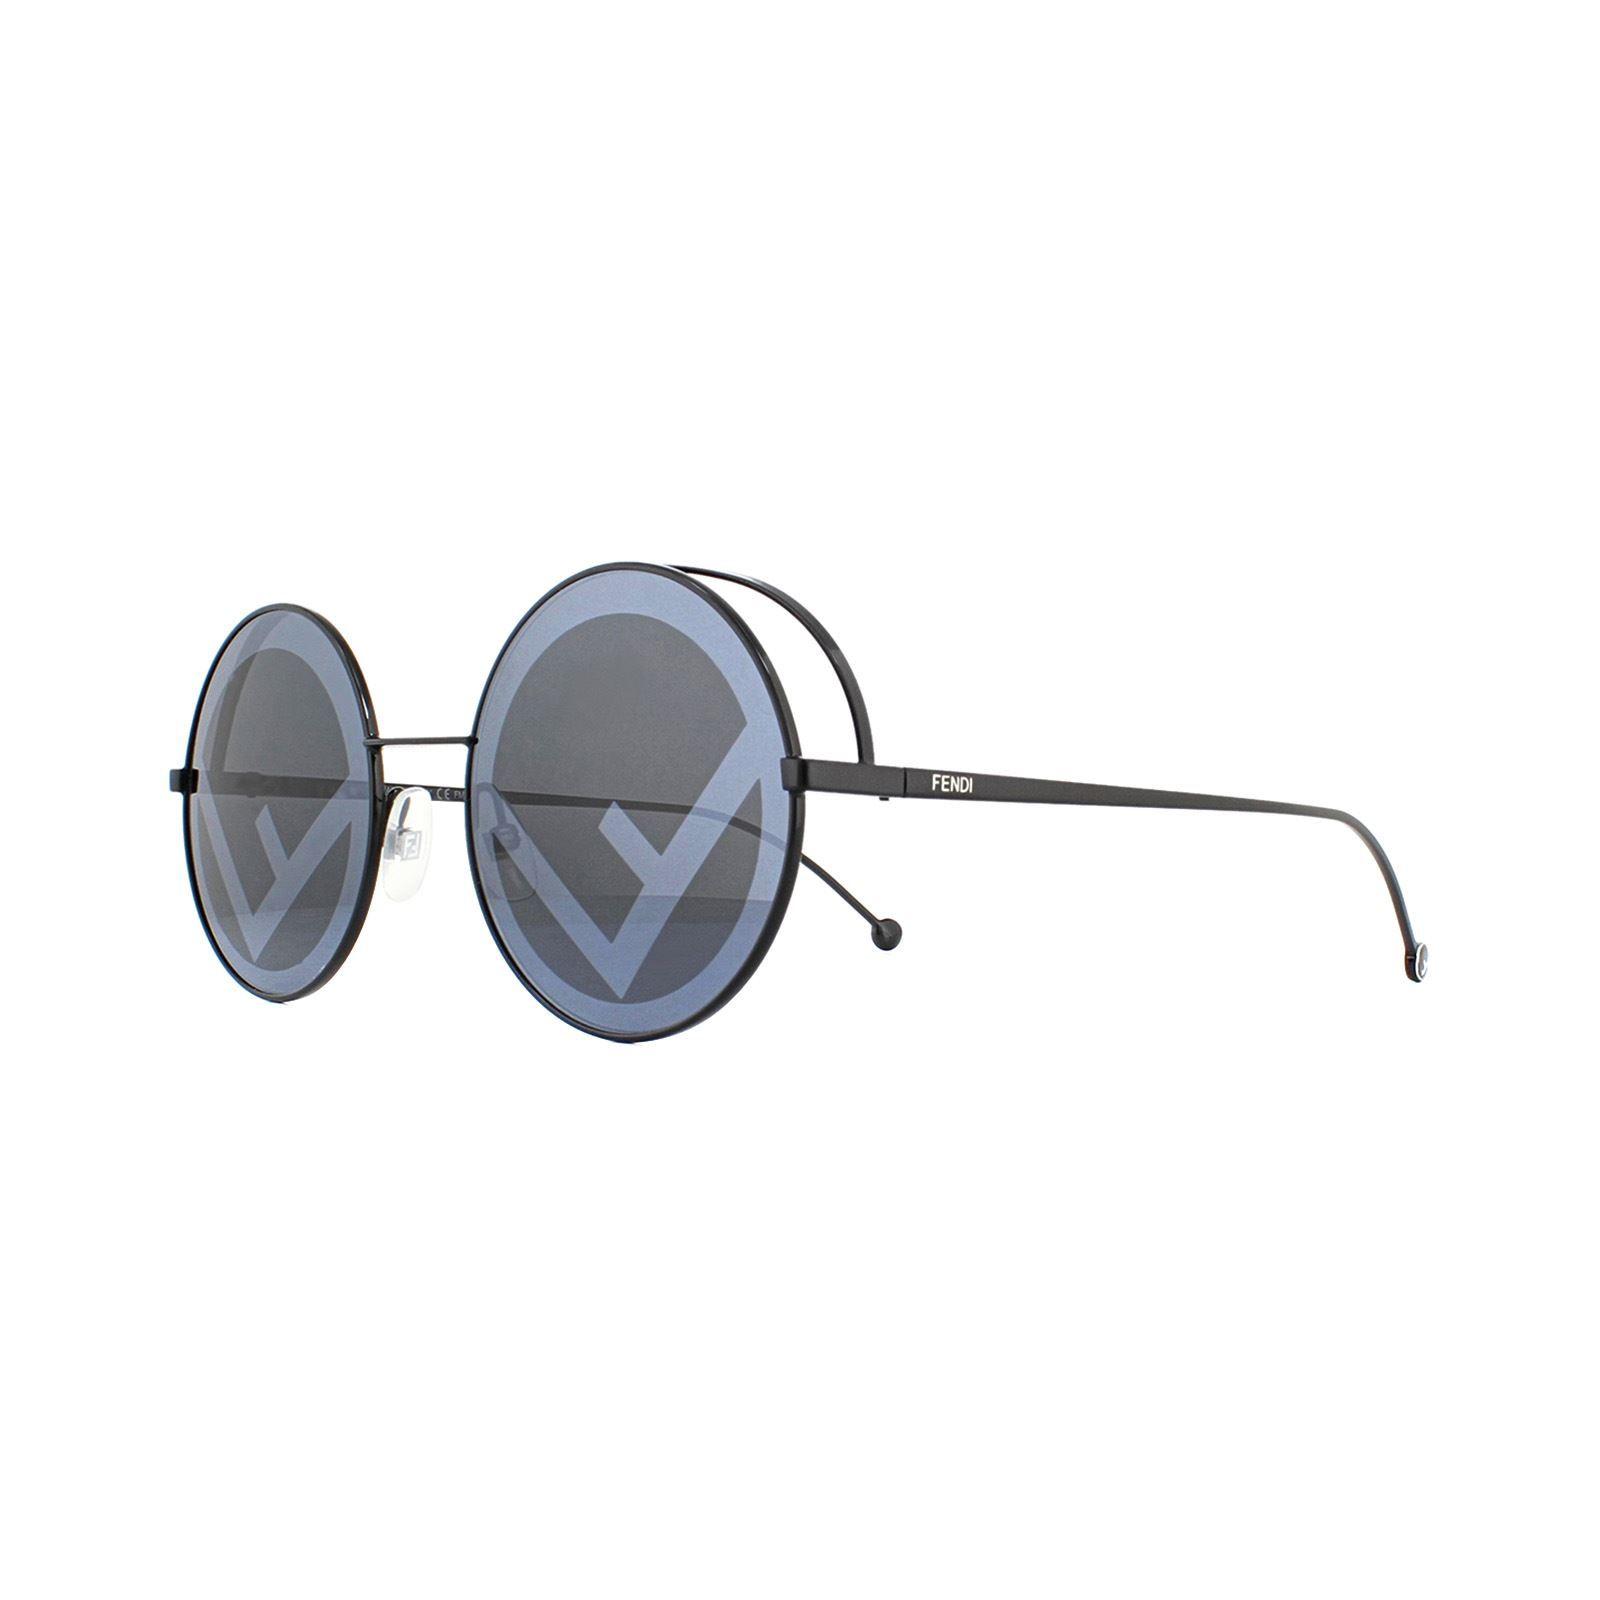 Fendi Sunglasses FF 0343/S Fendirama 807 MD Black Grey Fendi logo